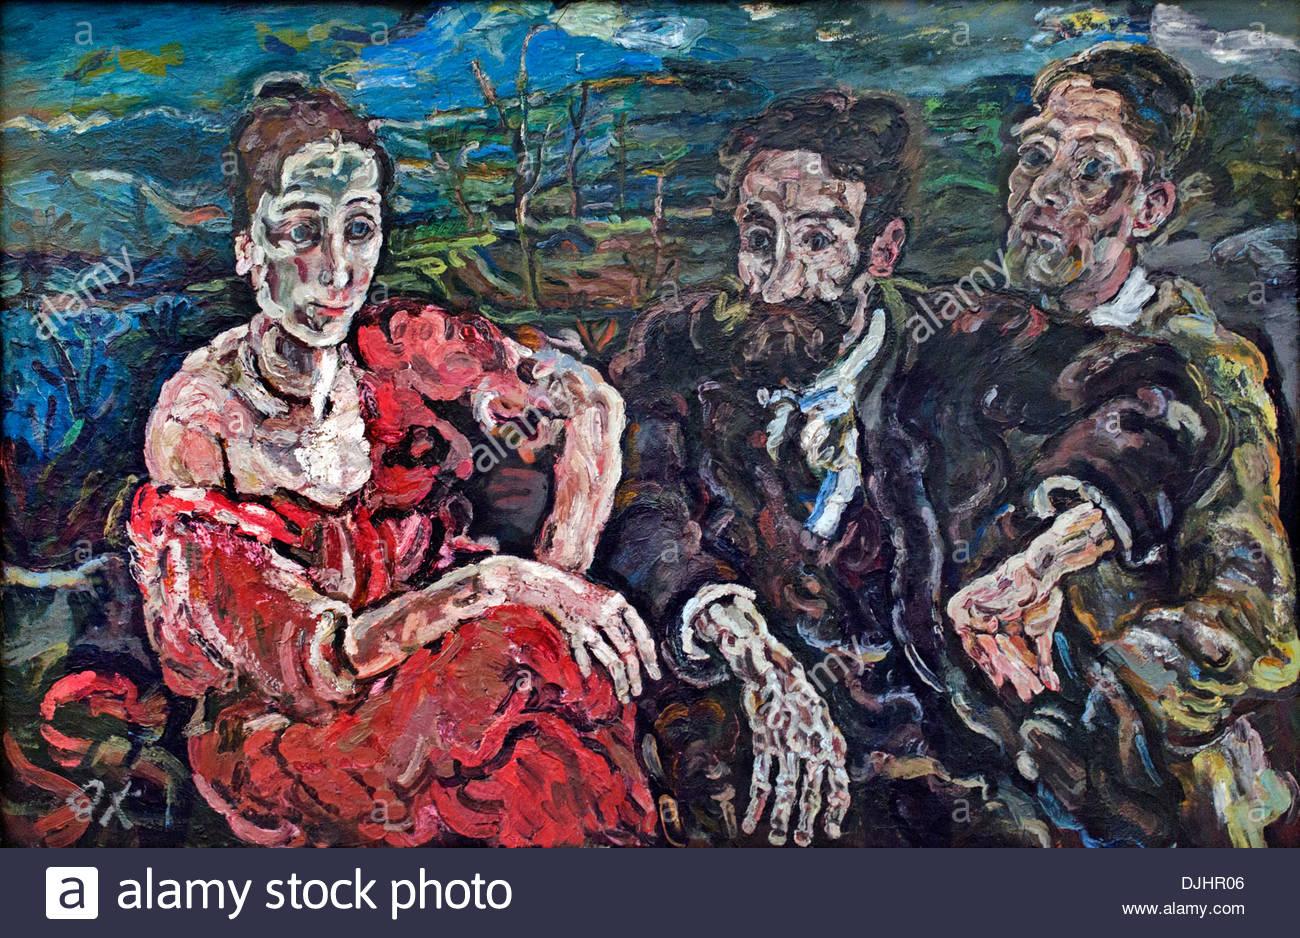 an introduction to the life of oskar kokoschka Self-portrait as degenerate artist by oskar kokoschka (1937) oil on canvas private collection, courtesy the scottish national gallery of modern art, edinburgh.